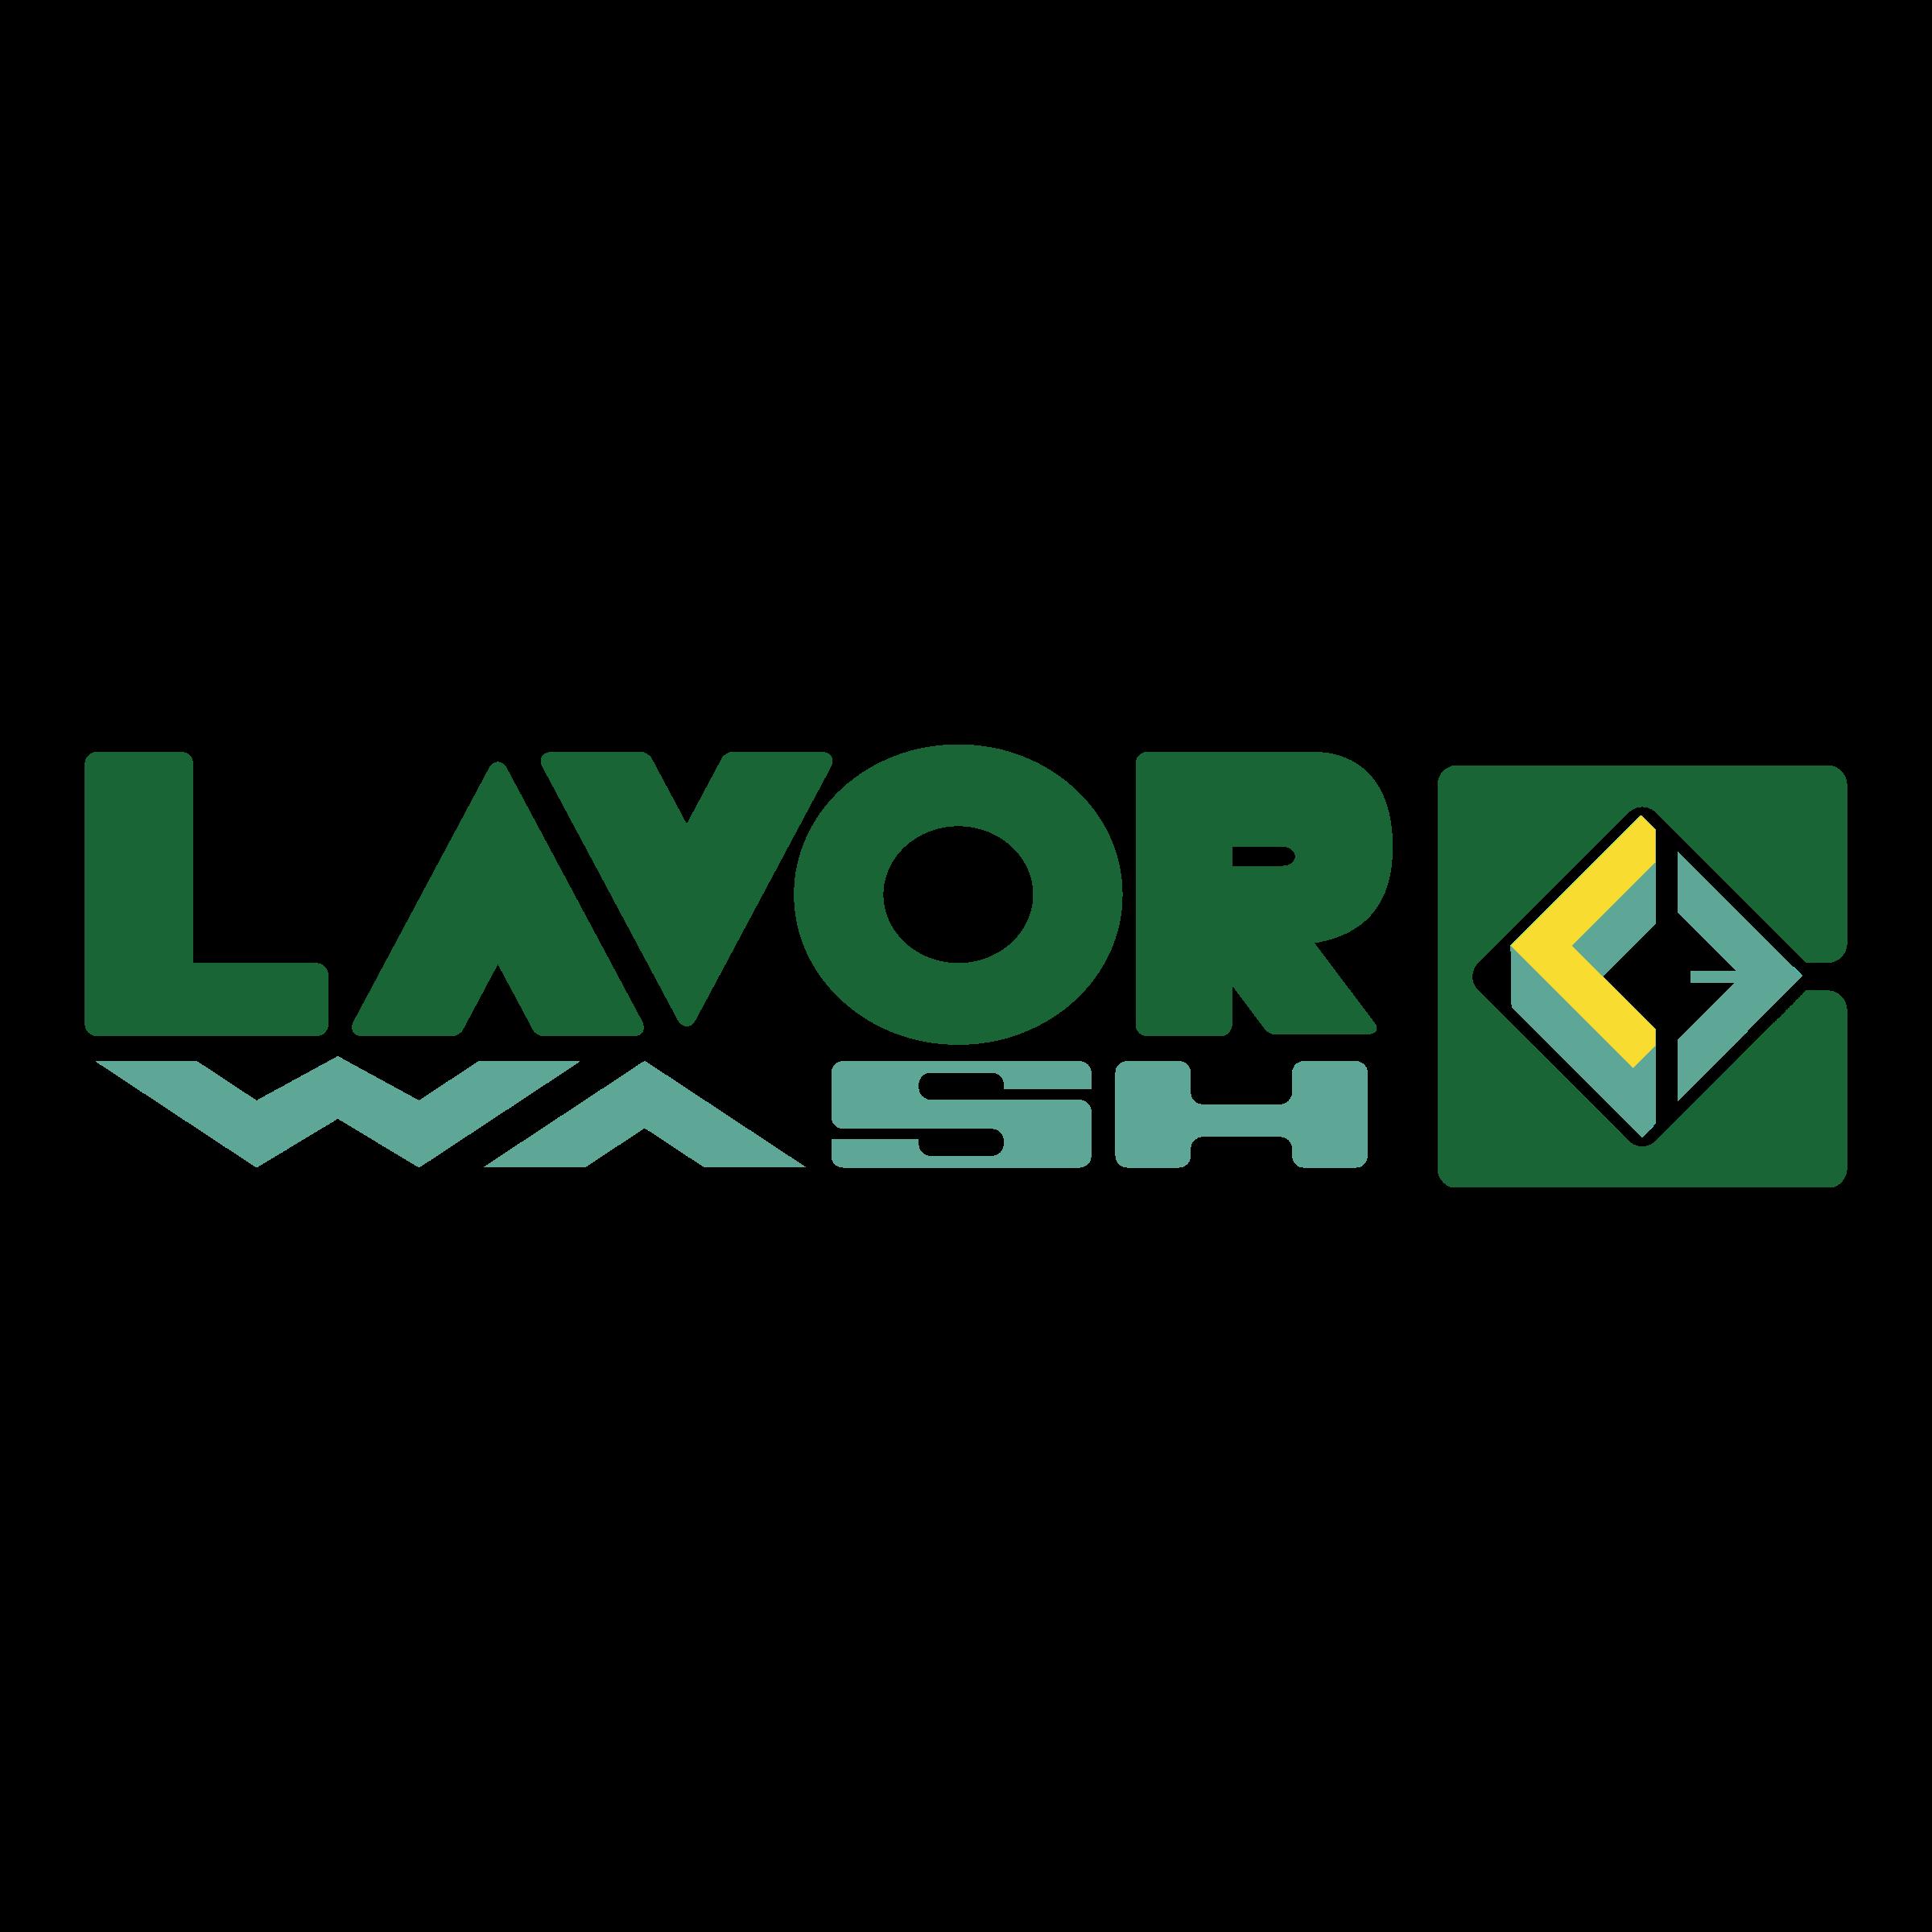 LAVORWASH